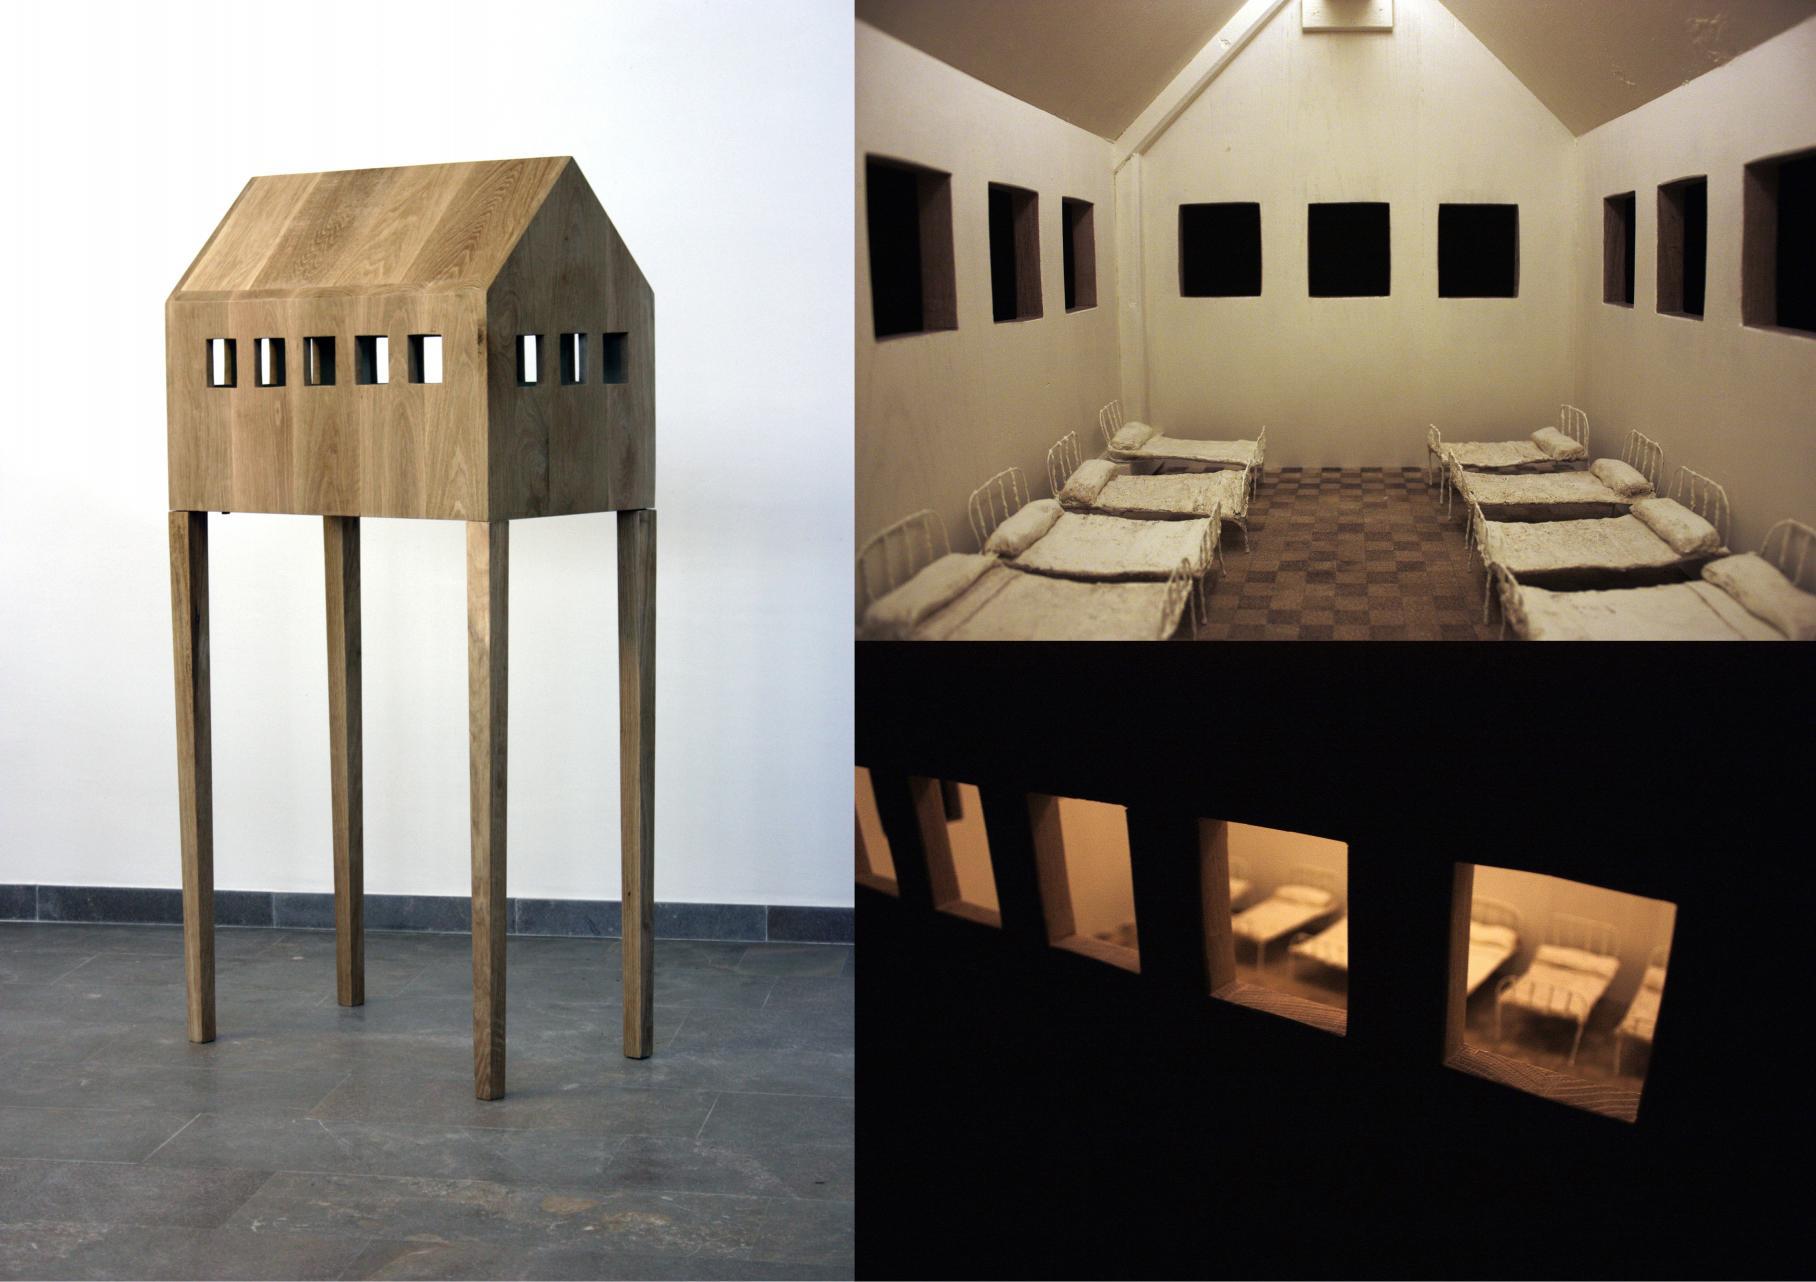 La casa grande (Hospital de muñecas) (2011) - Rossana Zaera Clausell